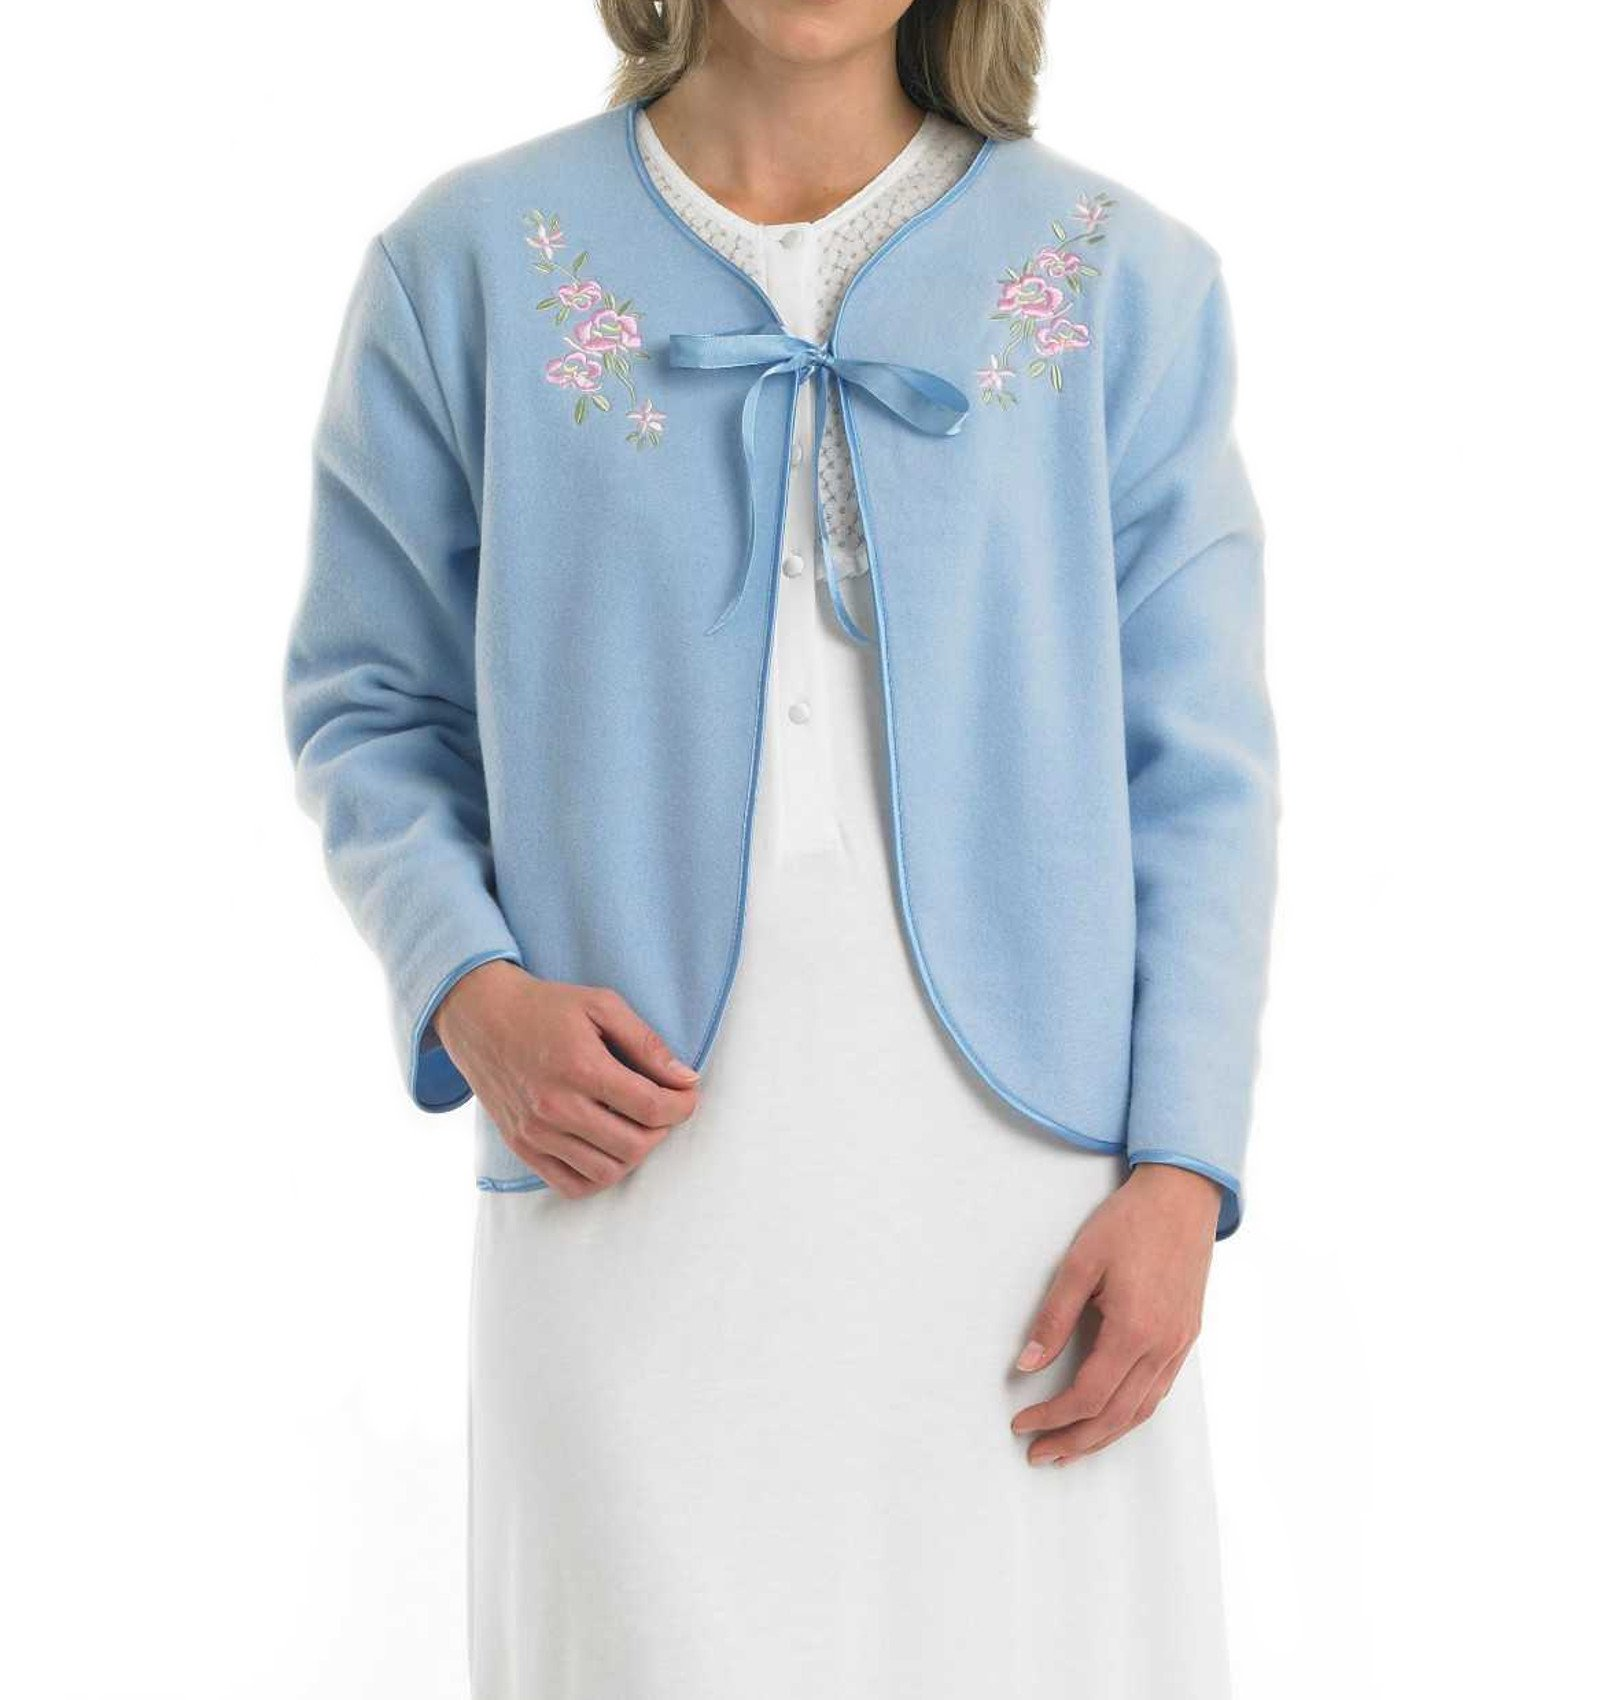 Slenderella Ladies Soft Polar Fleece Ribbon Tie Bed Jacket Floral Embroidered Detail House Coat